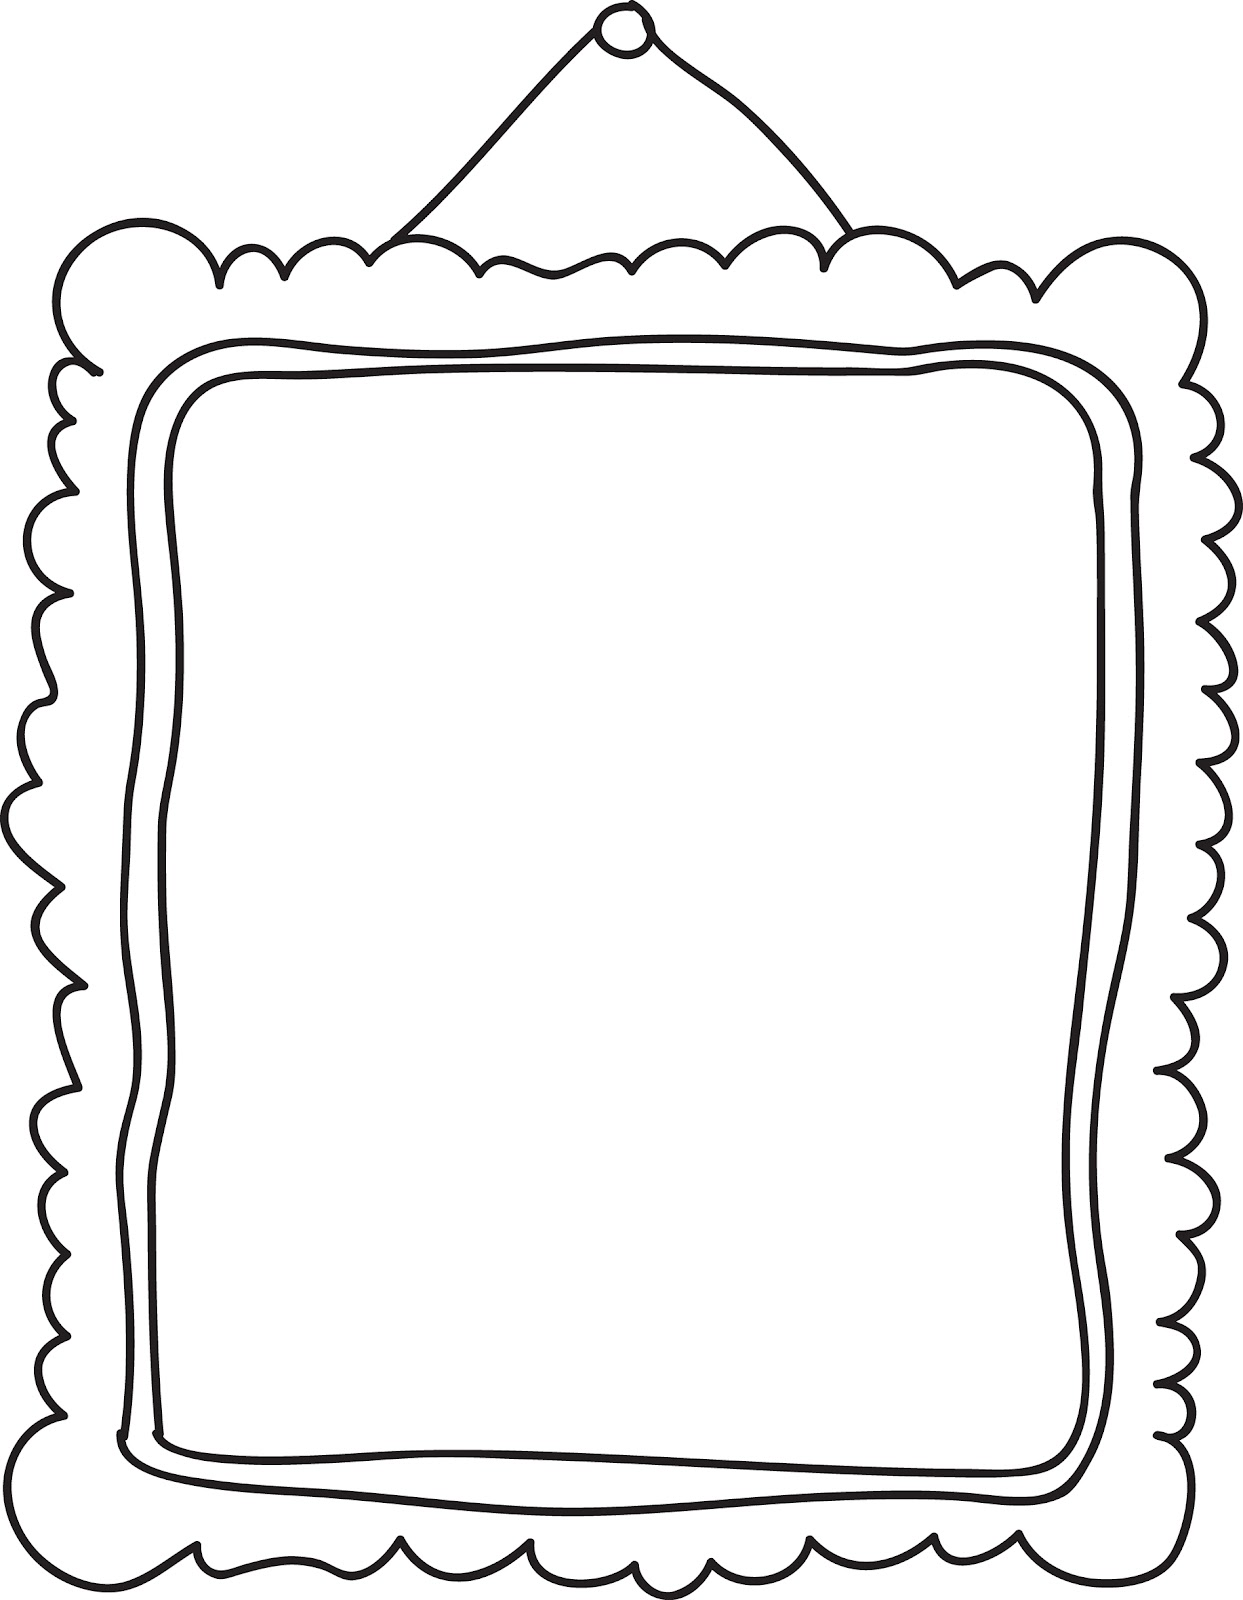 1243x1600 Doodle Art Picture Frame Image